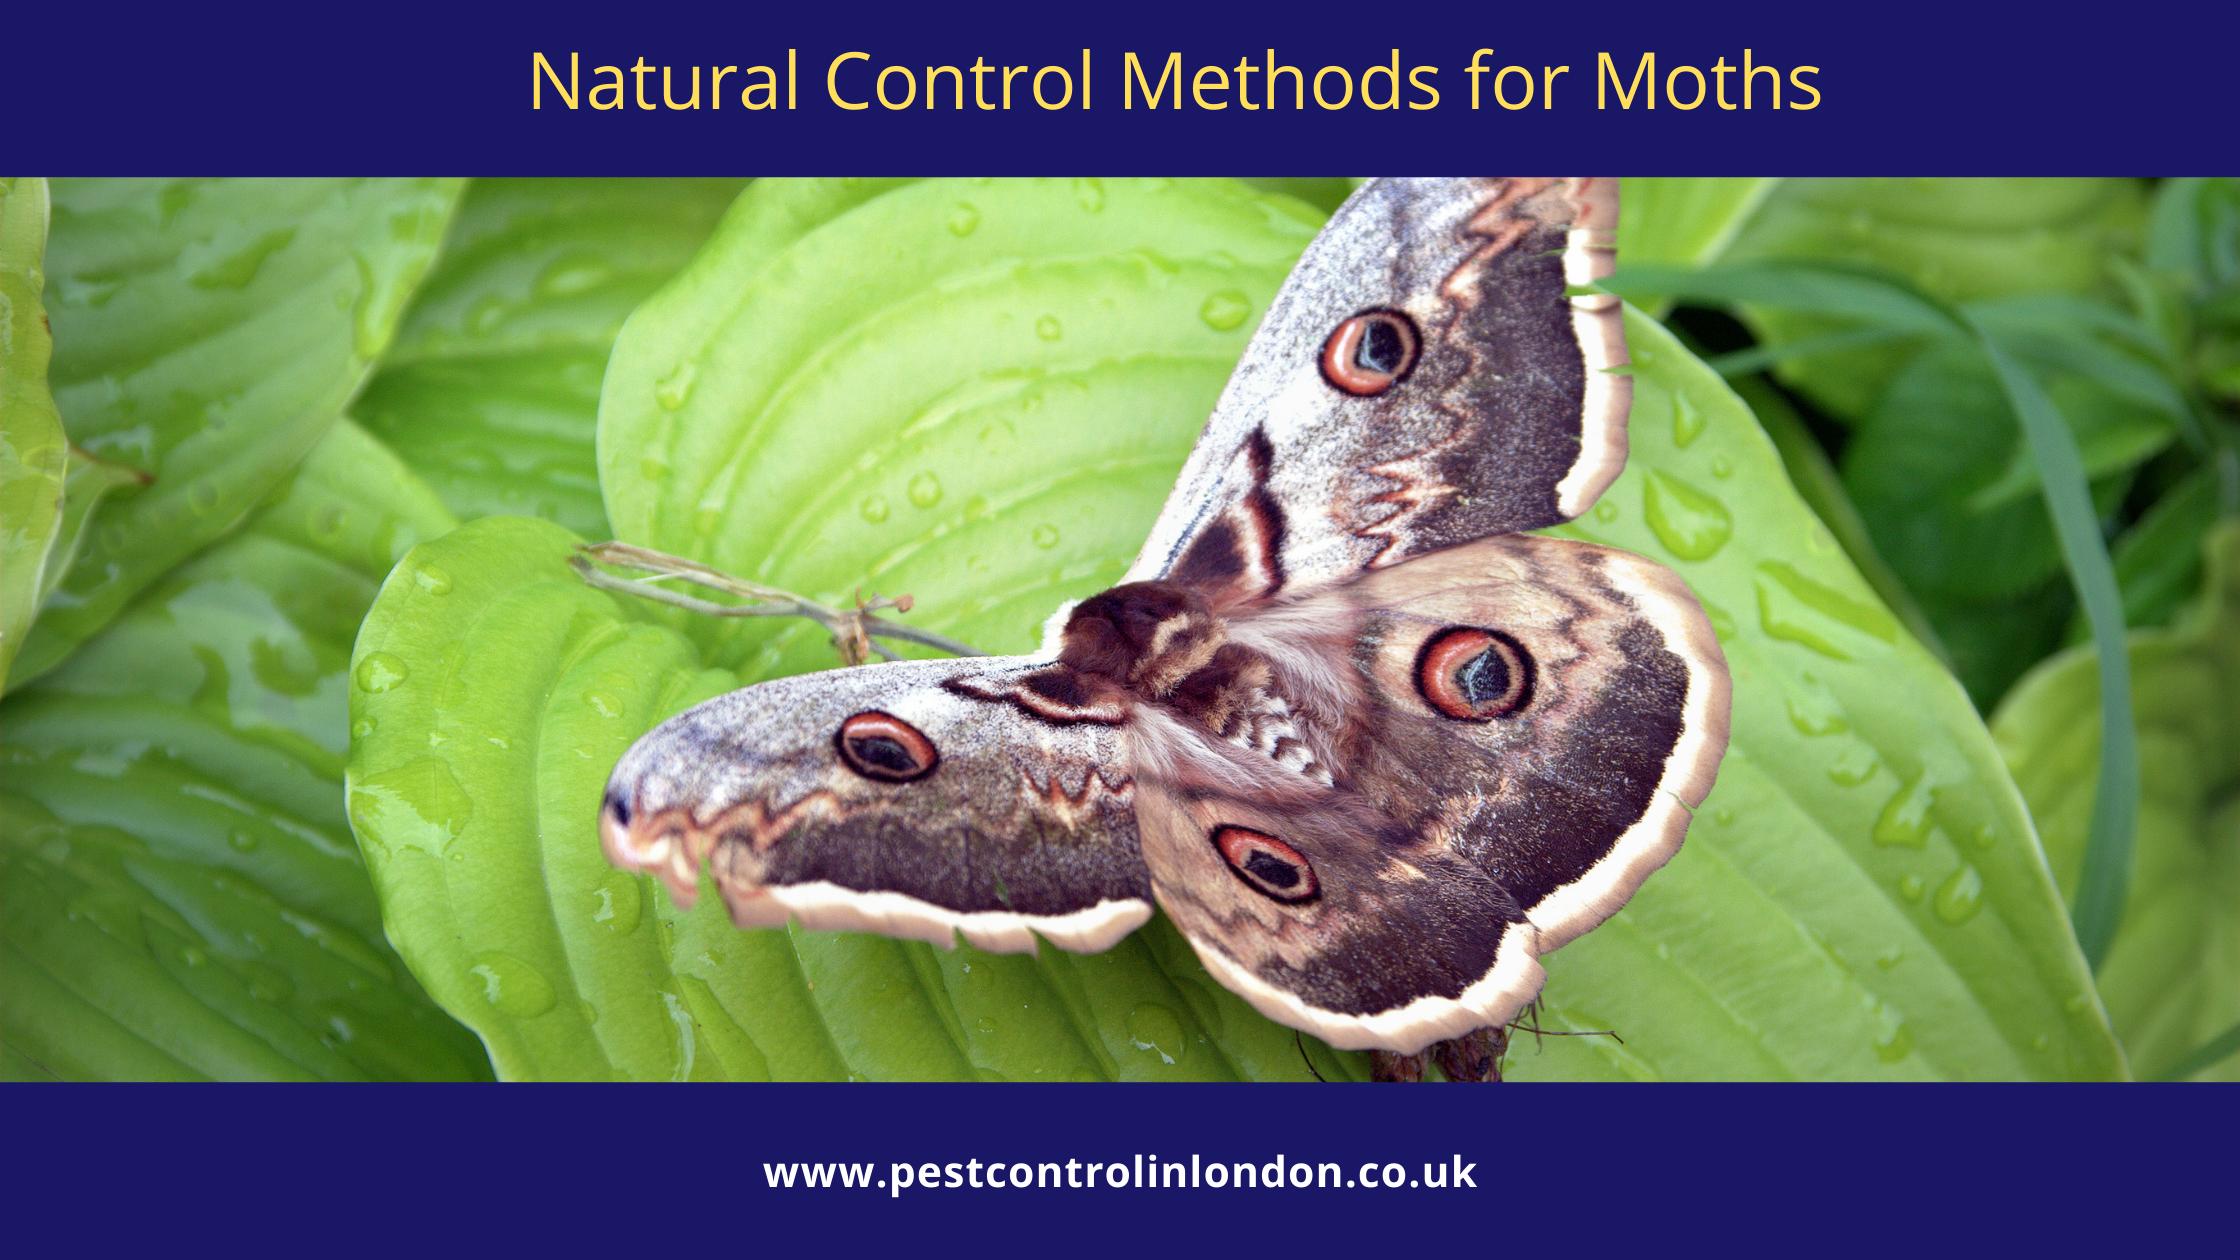 Natural Control Methods for Moths